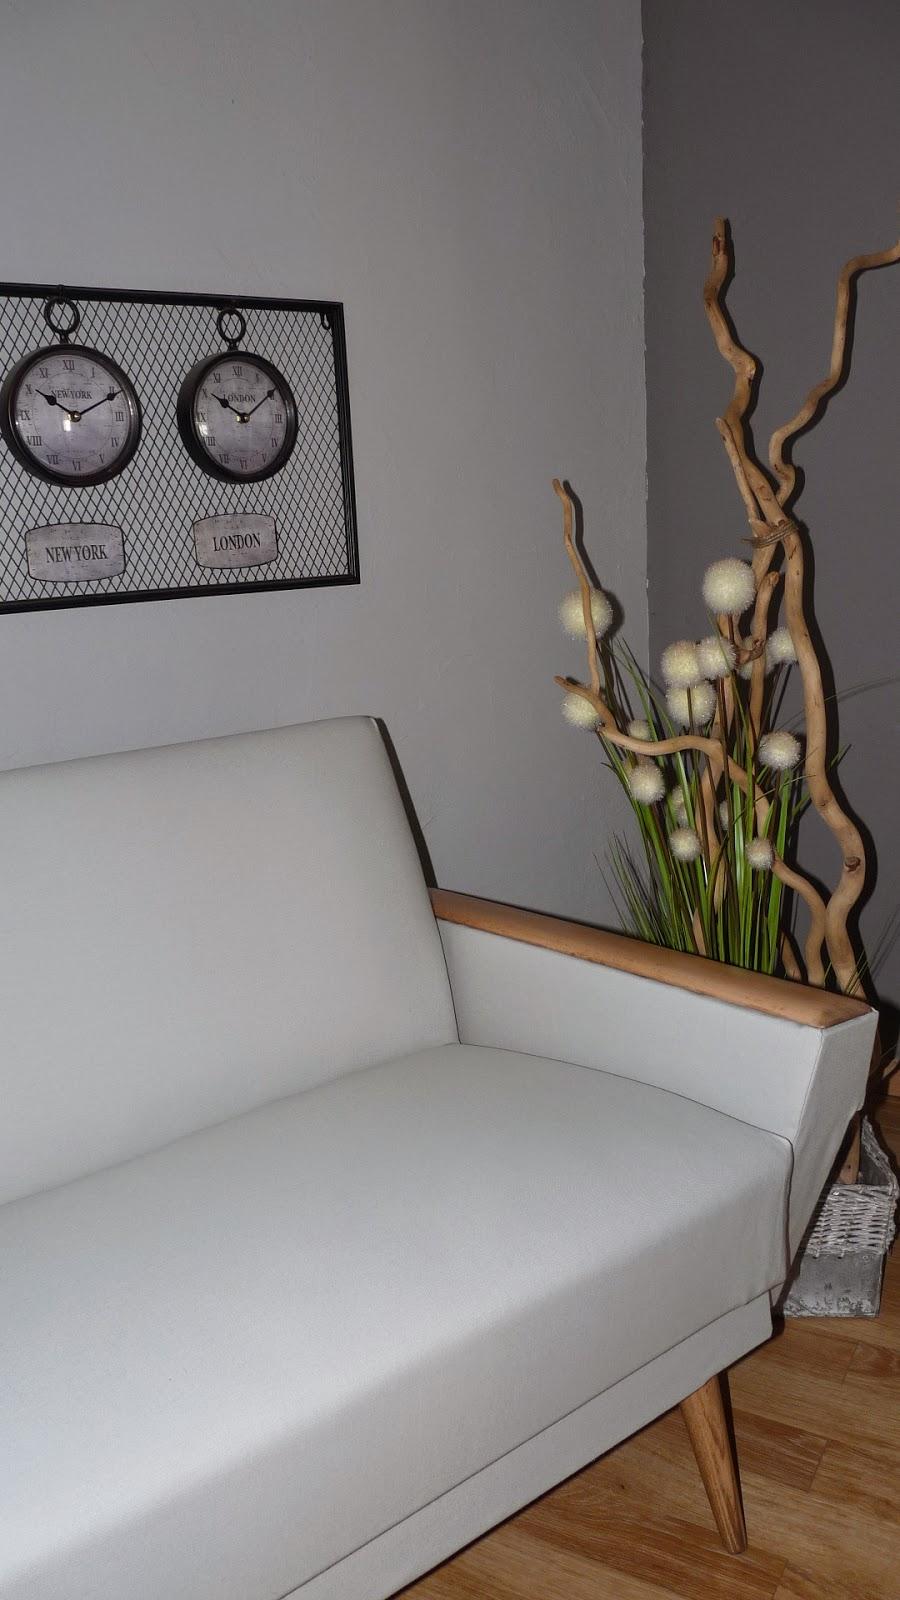 l 39 atelier de bobolina norma jean le boom du vintage. Black Bedroom Furniture Sets. Home Design Ideas